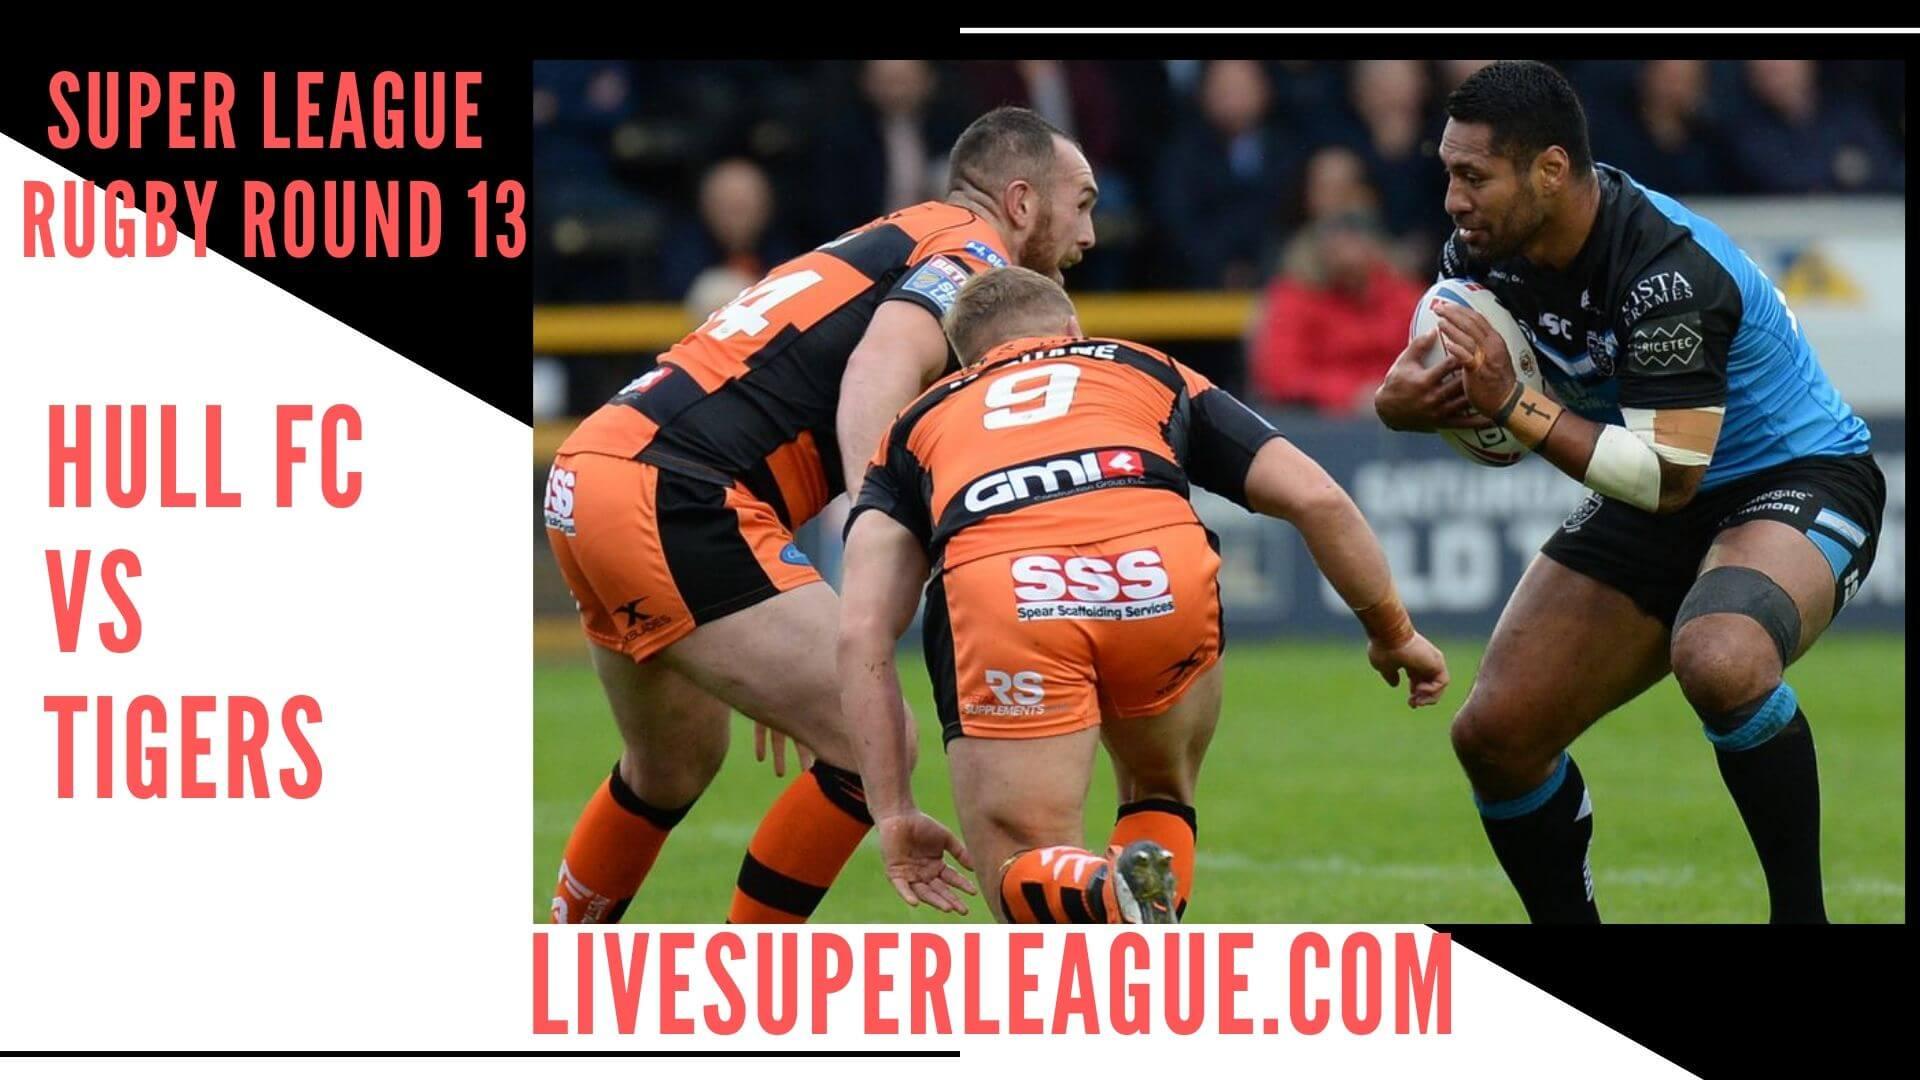 Hull Fc Vs Castleford Tigers Live Stream   Round 13